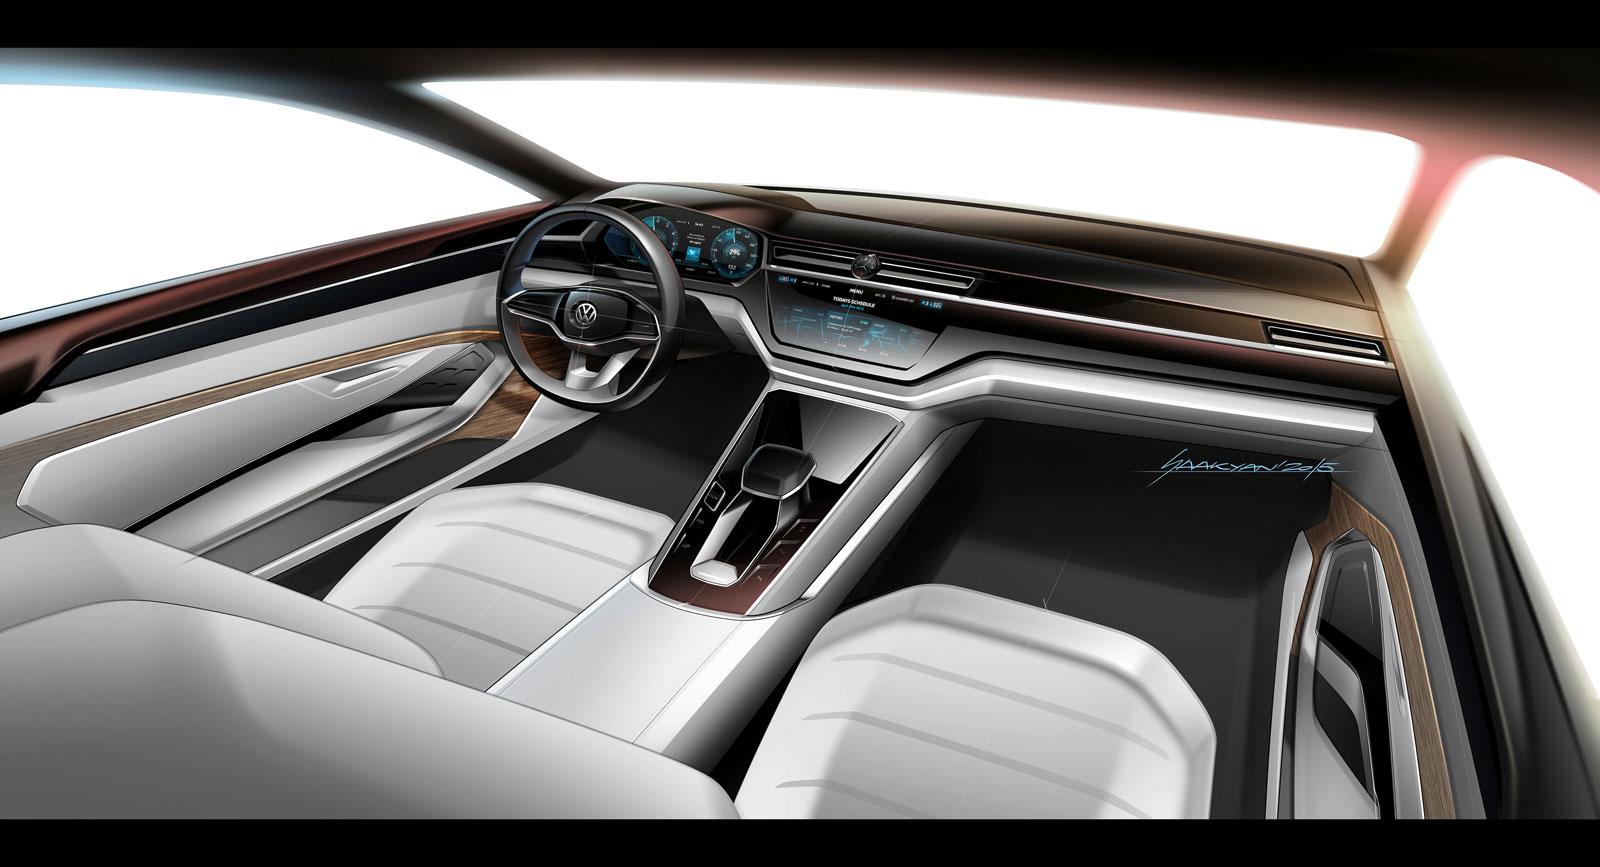 BMW M8 2015 >> Volkswagen C Coupe GTE Concept Interior Design Sketch ...